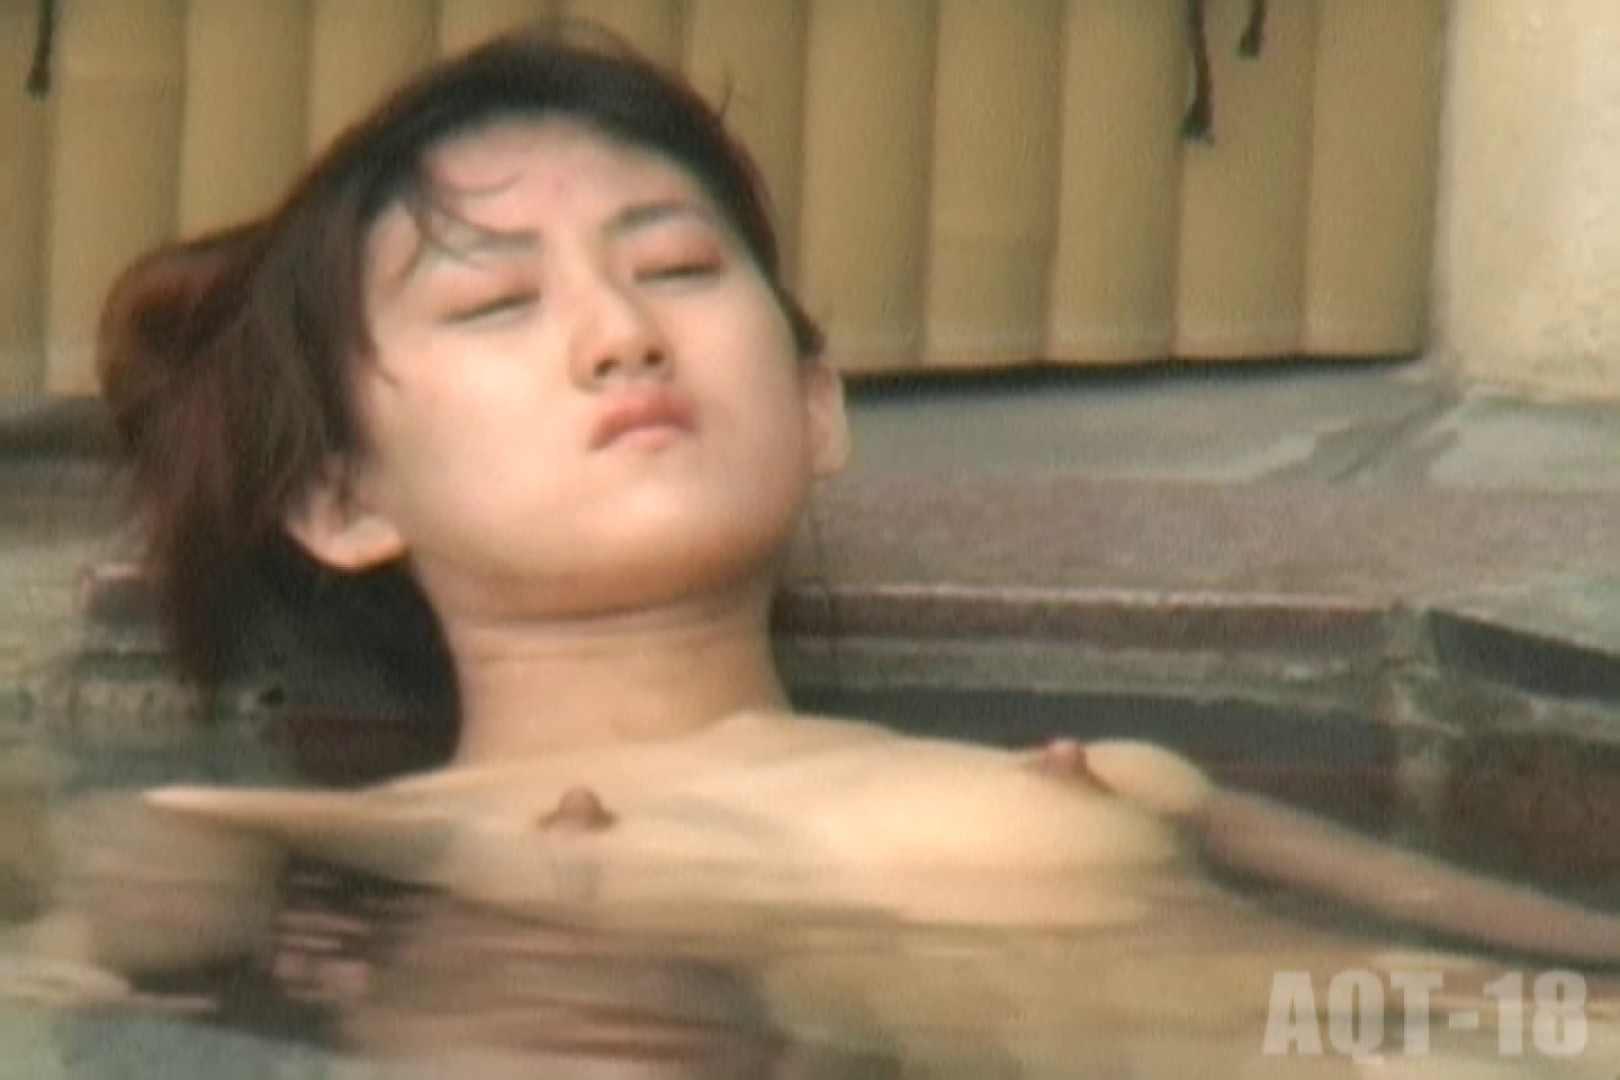 Aquaな露天風呂Vol.862 盗撮師作品  99pic 69